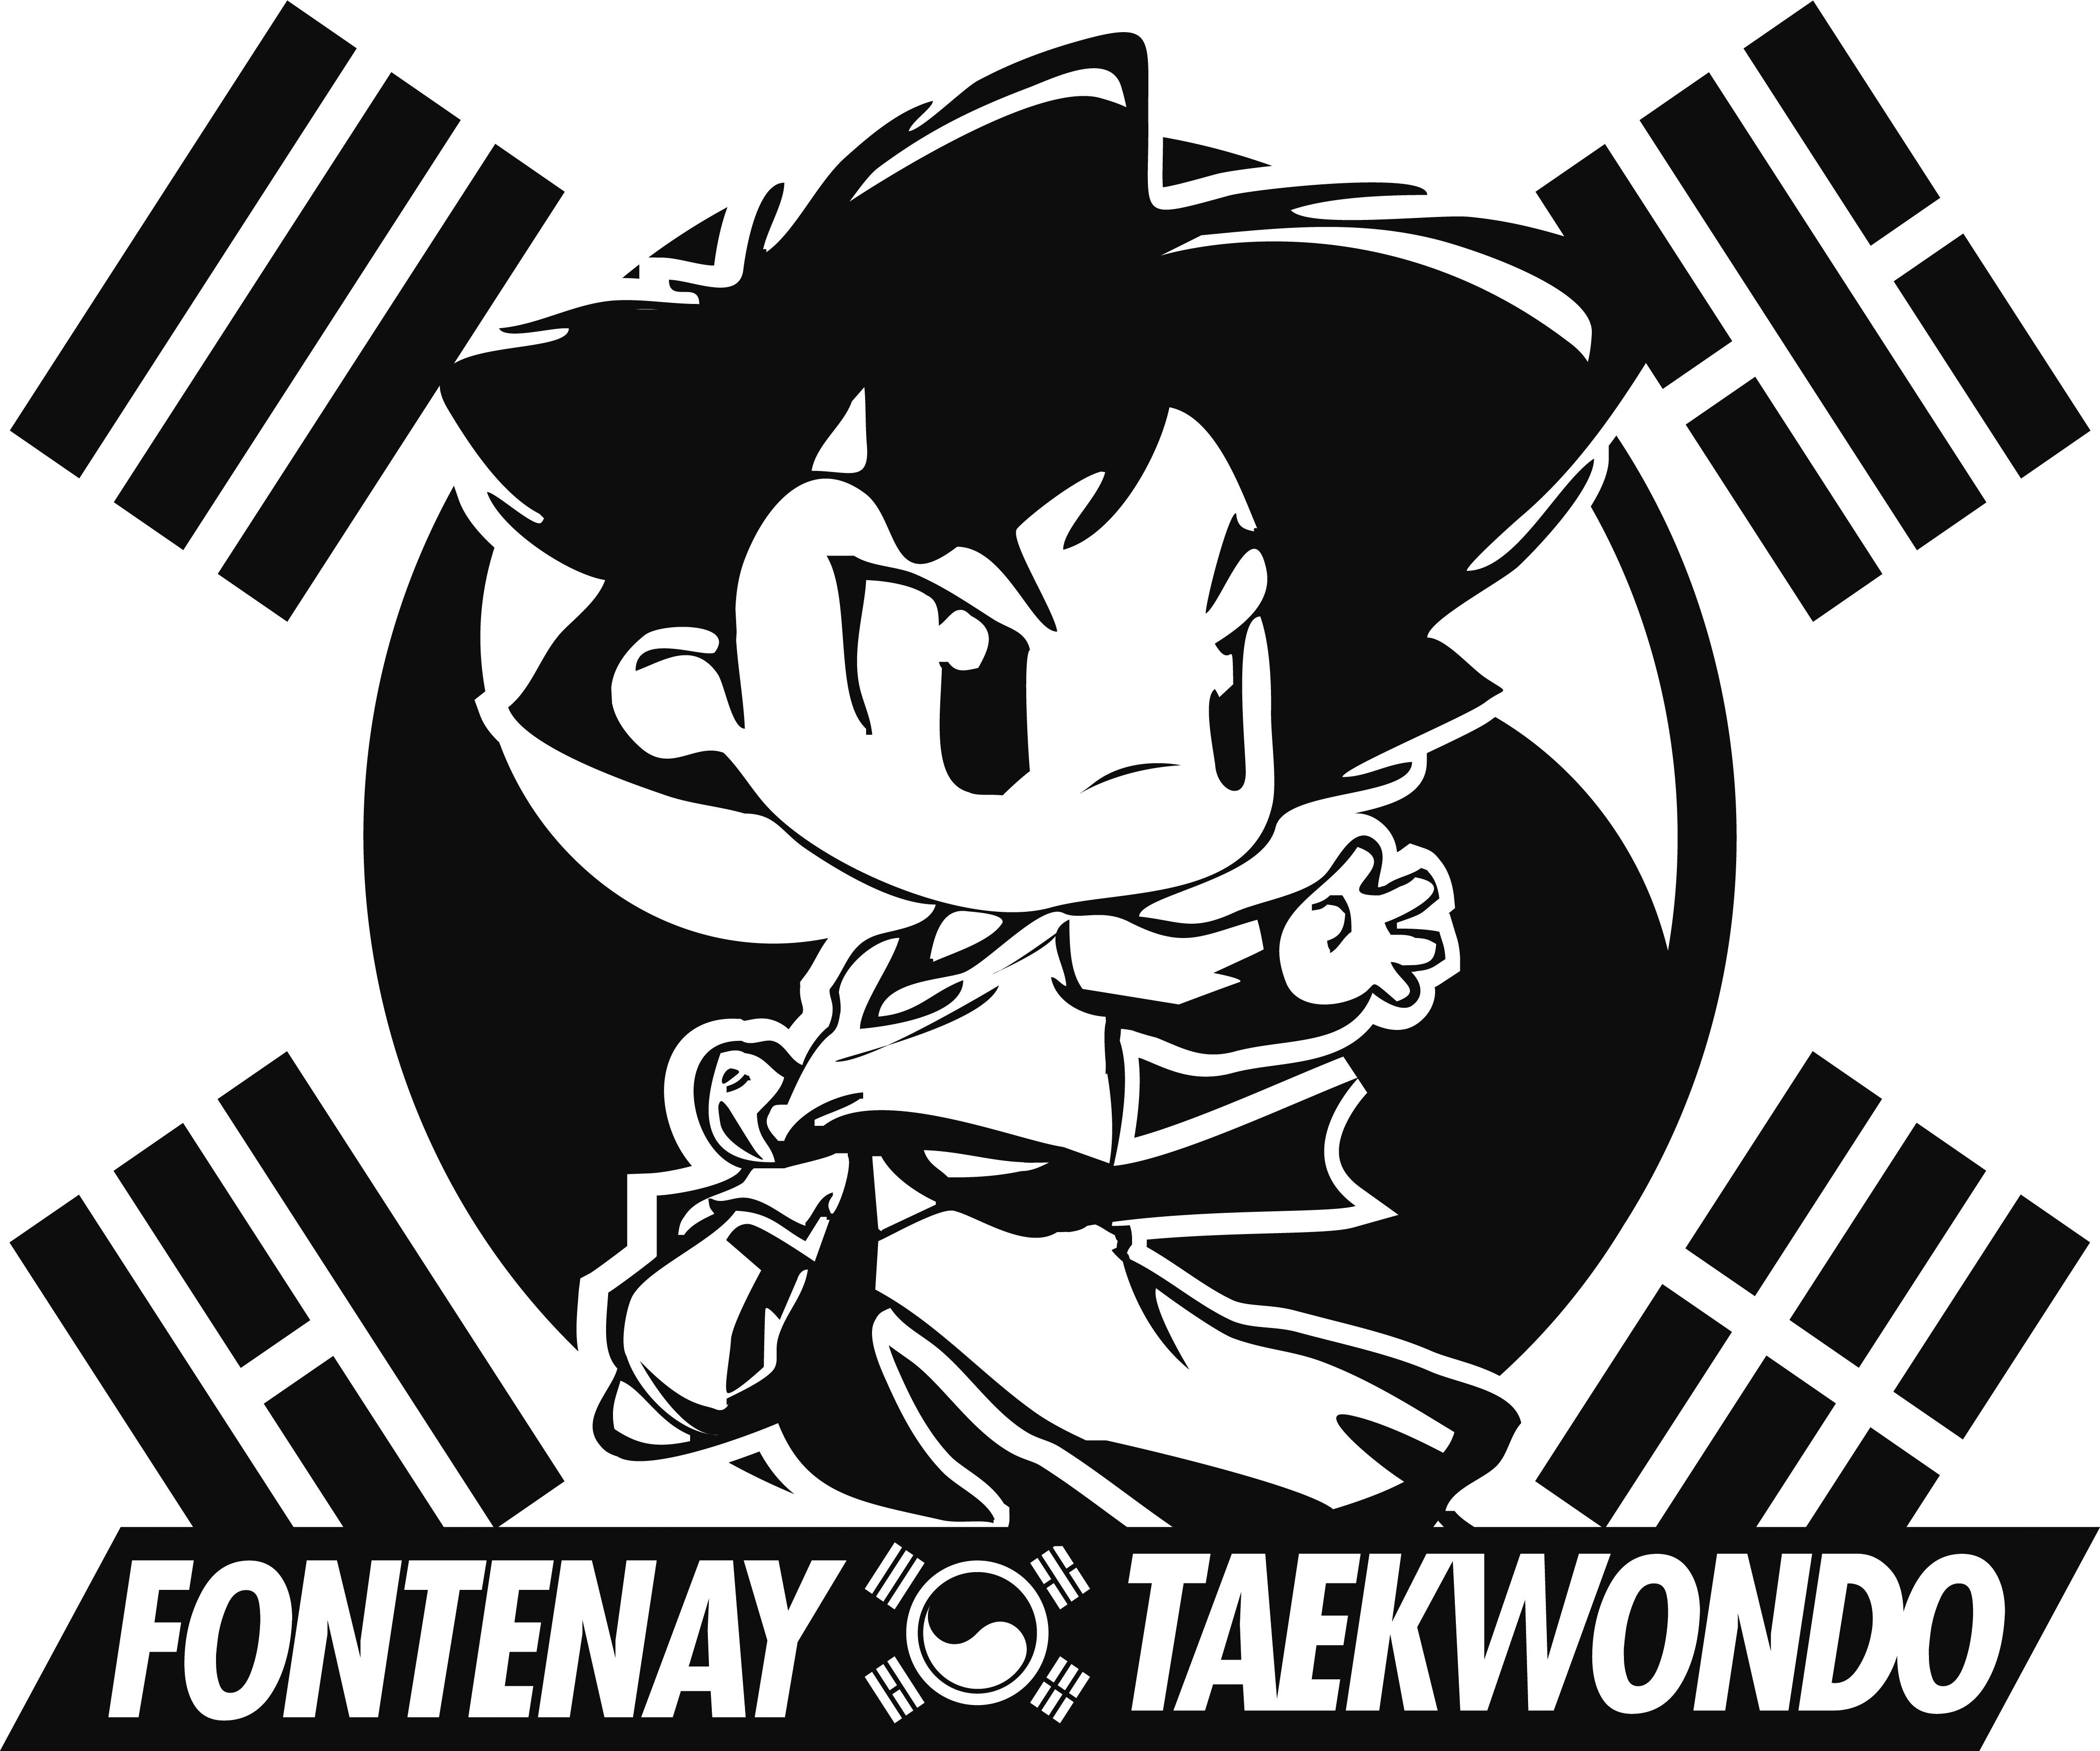 USF Taekwondo Fontenay